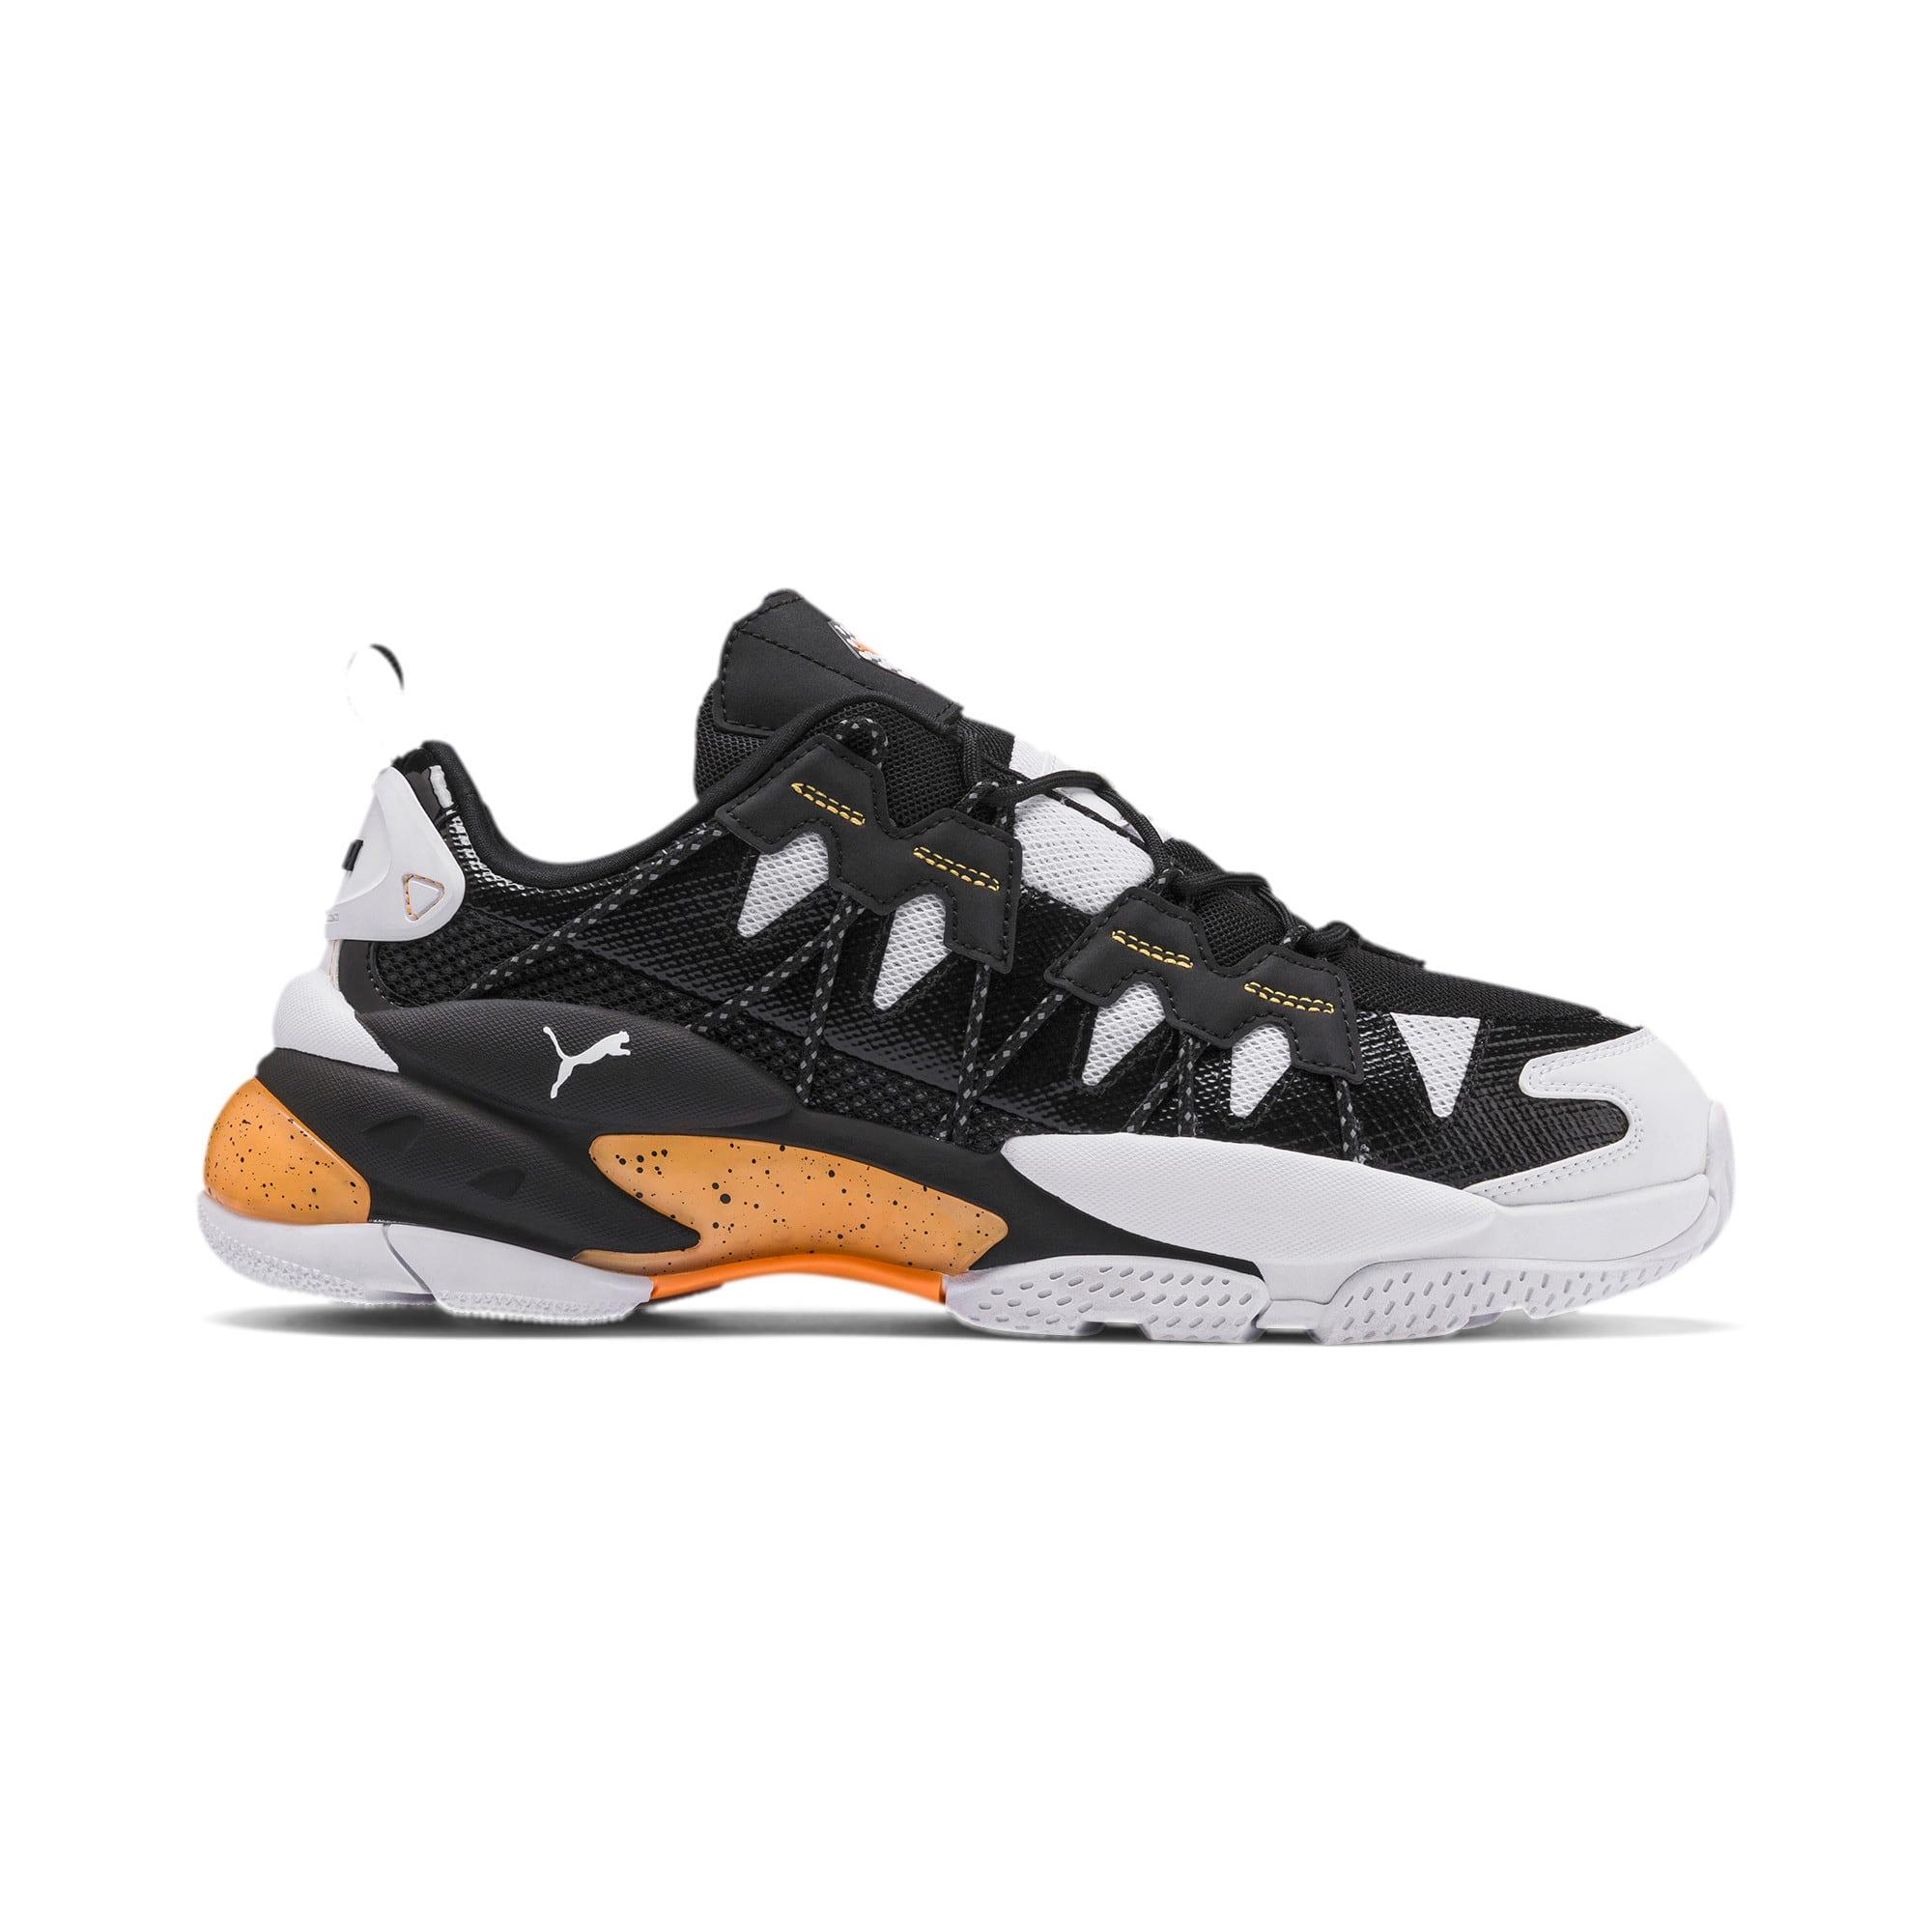 Thumbnail 5 of LQDCELL Omega Density Training Shoes, Puma White-Puma Black, medium